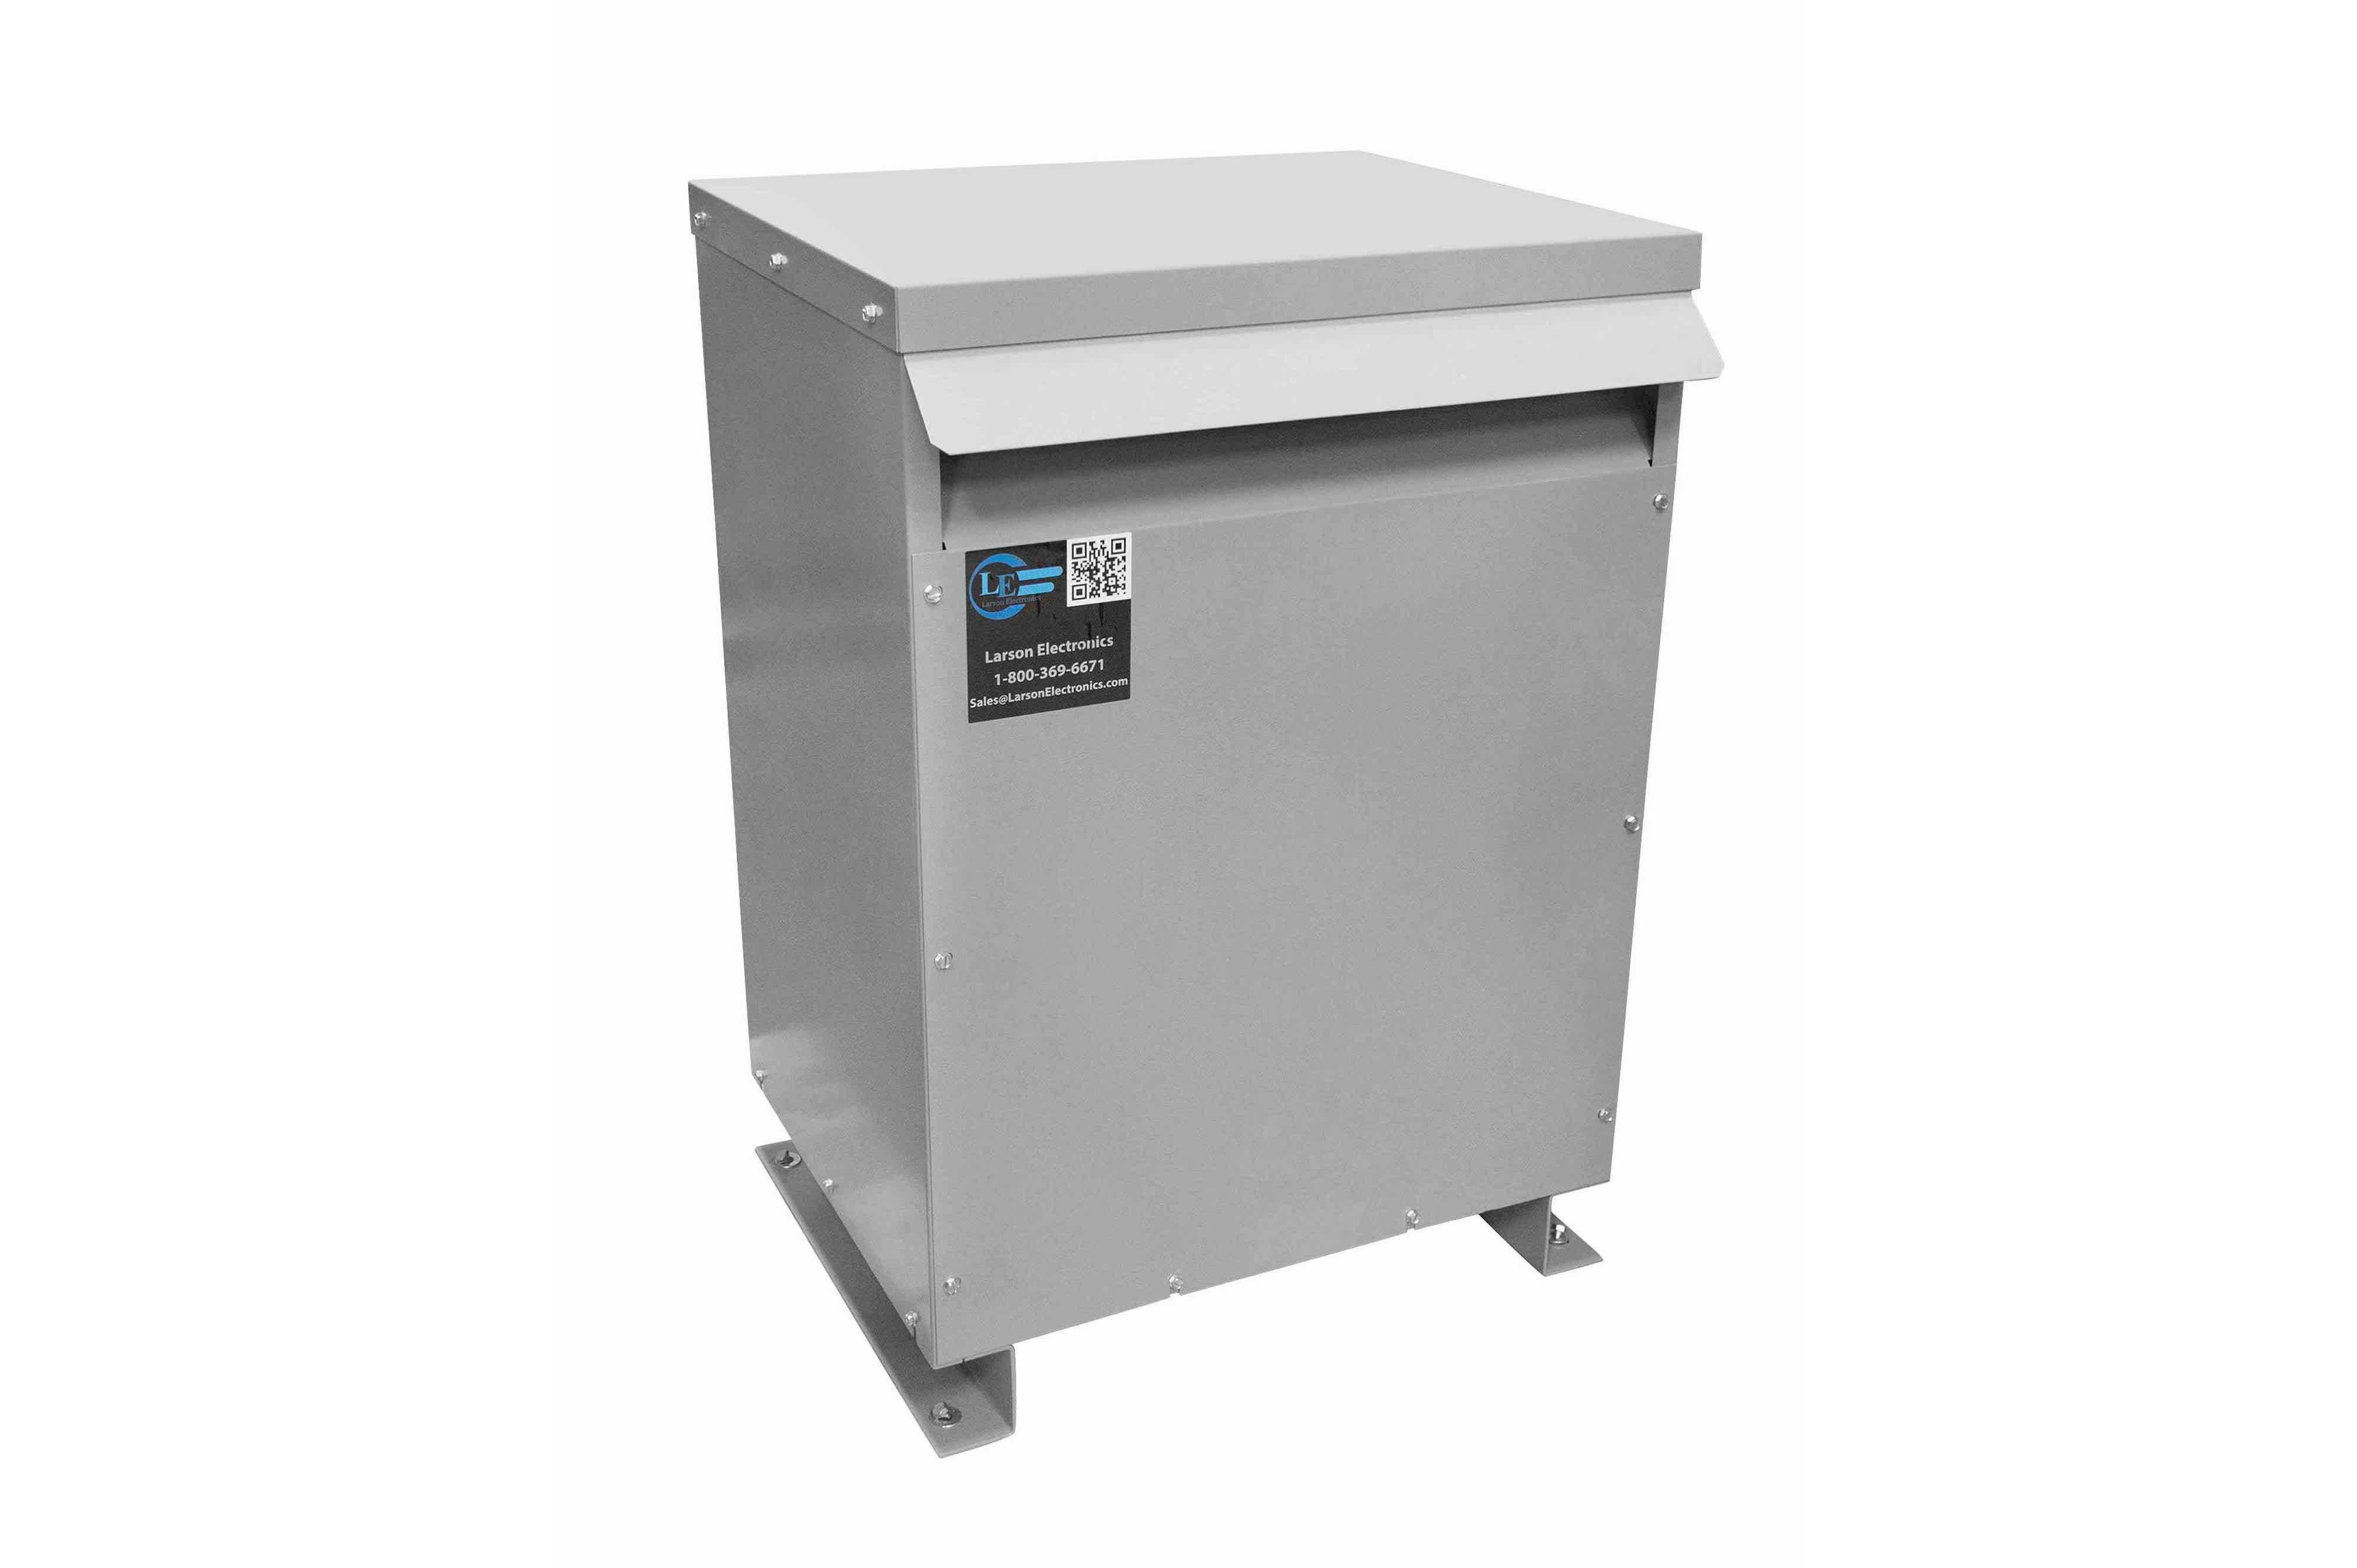 37.5 kVA 3PH Isolation Transformer, 575V Wye Primary, 208Y/120 Wye-N Secondary, N3R, Ventilated, 60 Hz